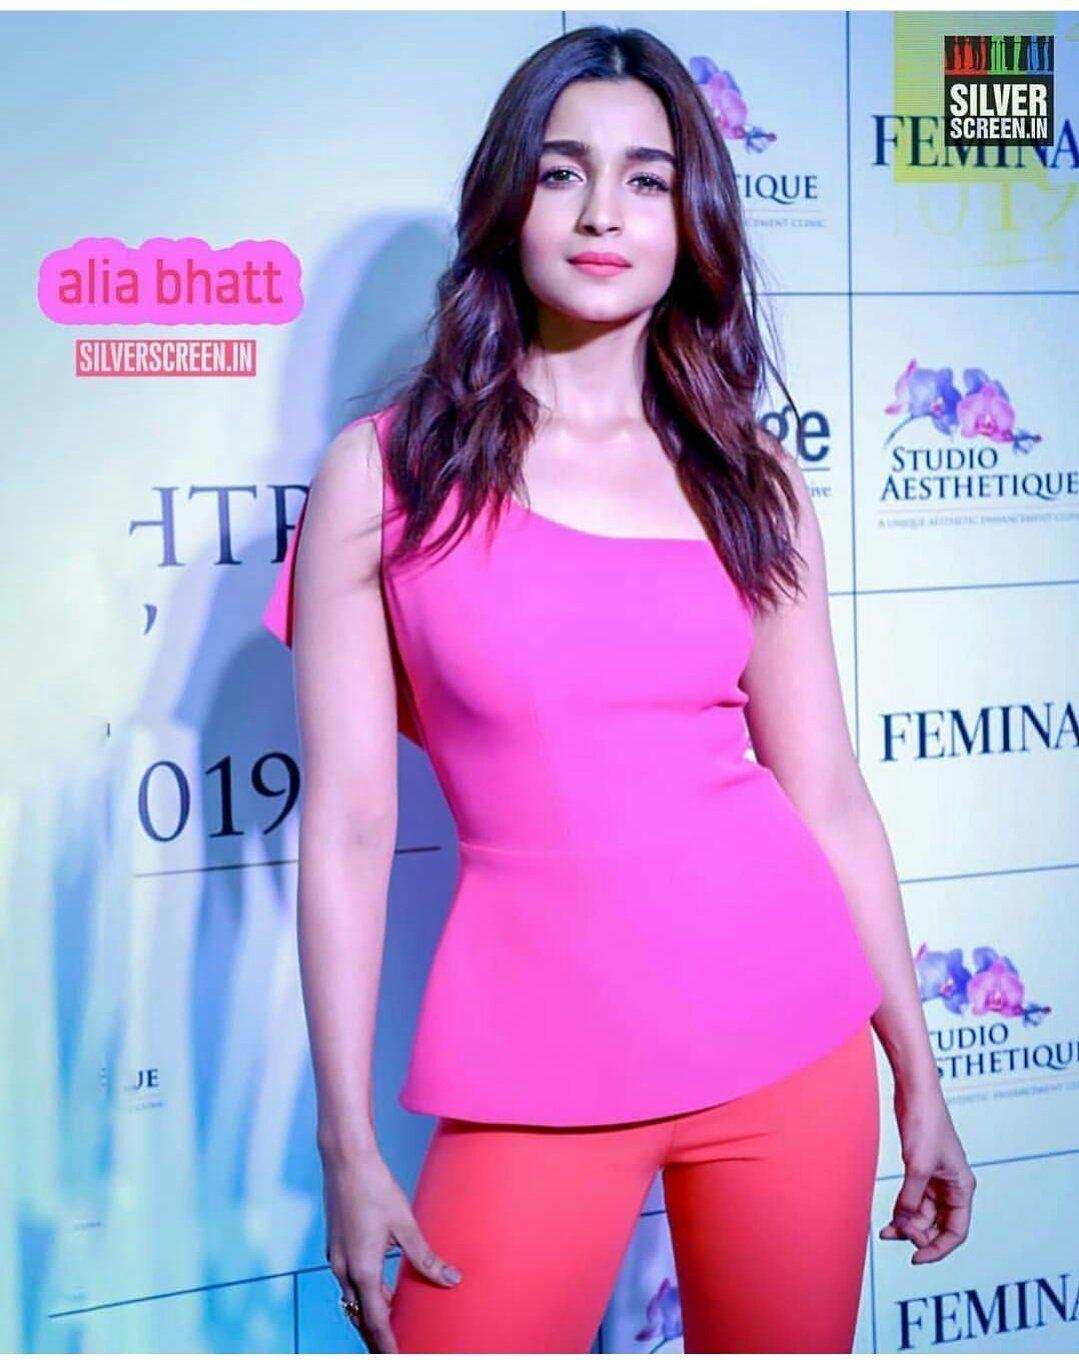 Pin By Orarra Girabbo On Alia Bhatt In 2020 Alia Bhatt Cute